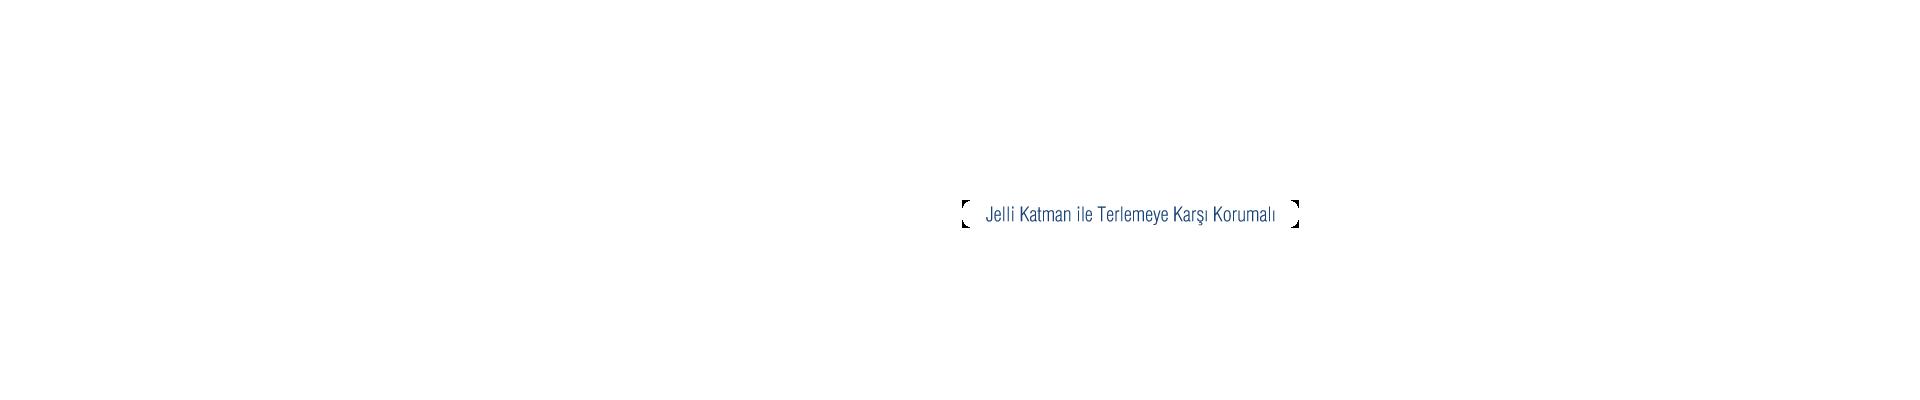 Banner Bedaid Tekerlekli Sandalye Minderi  Kutu2